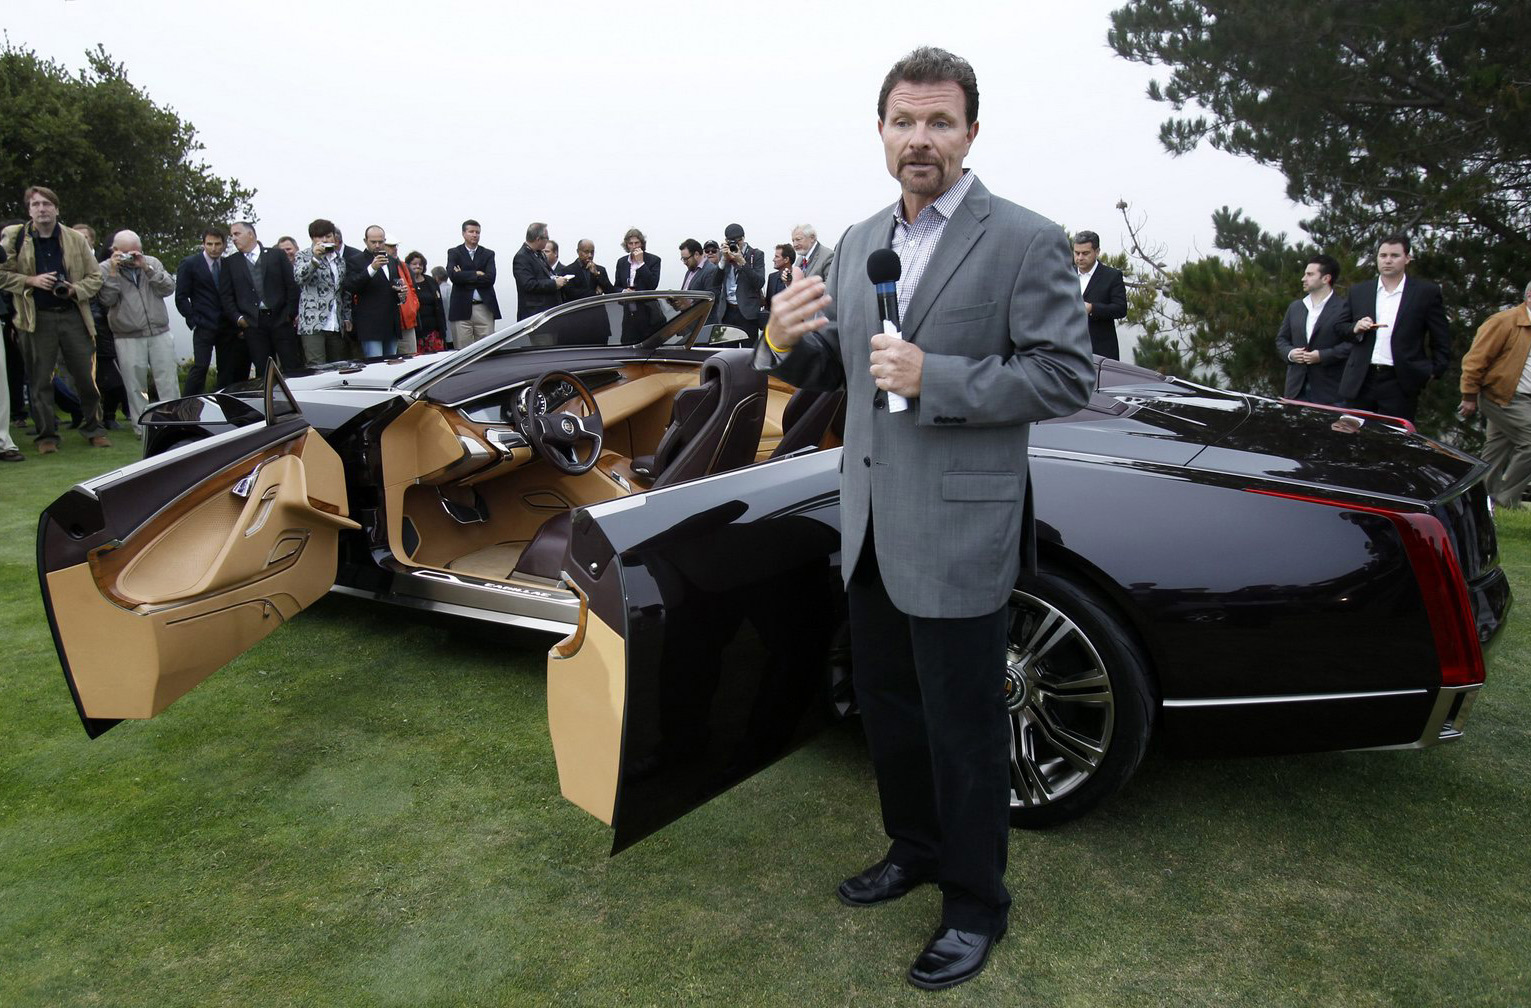 Cadillac 4 Door Convertible Concept 4-door Convertible Concept